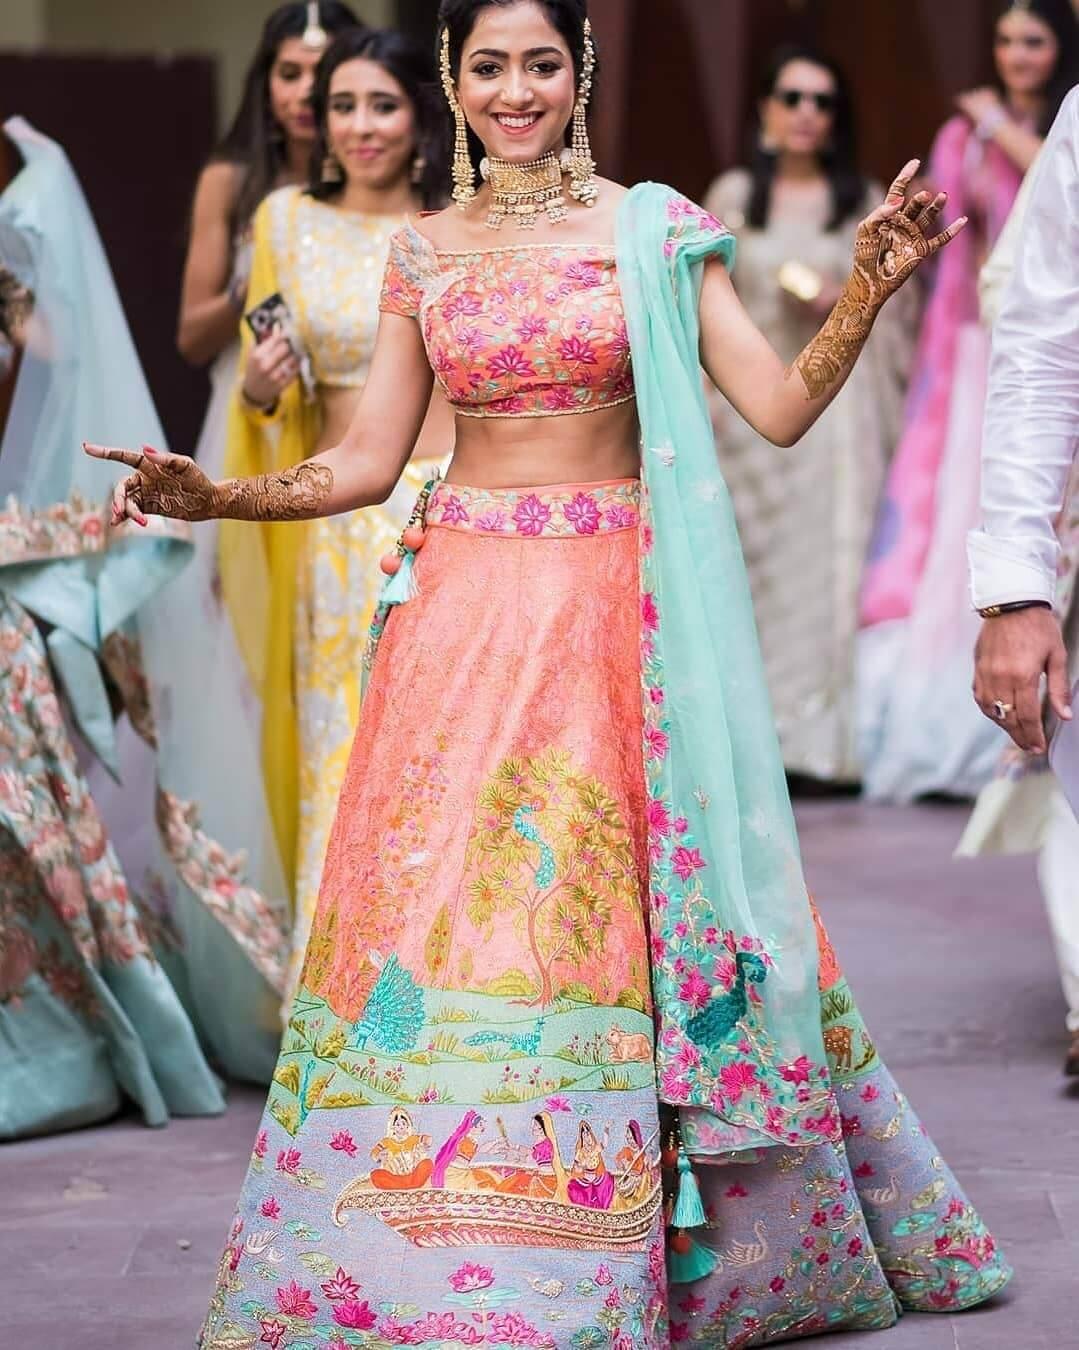 dancing pose of bridal in mehndi function